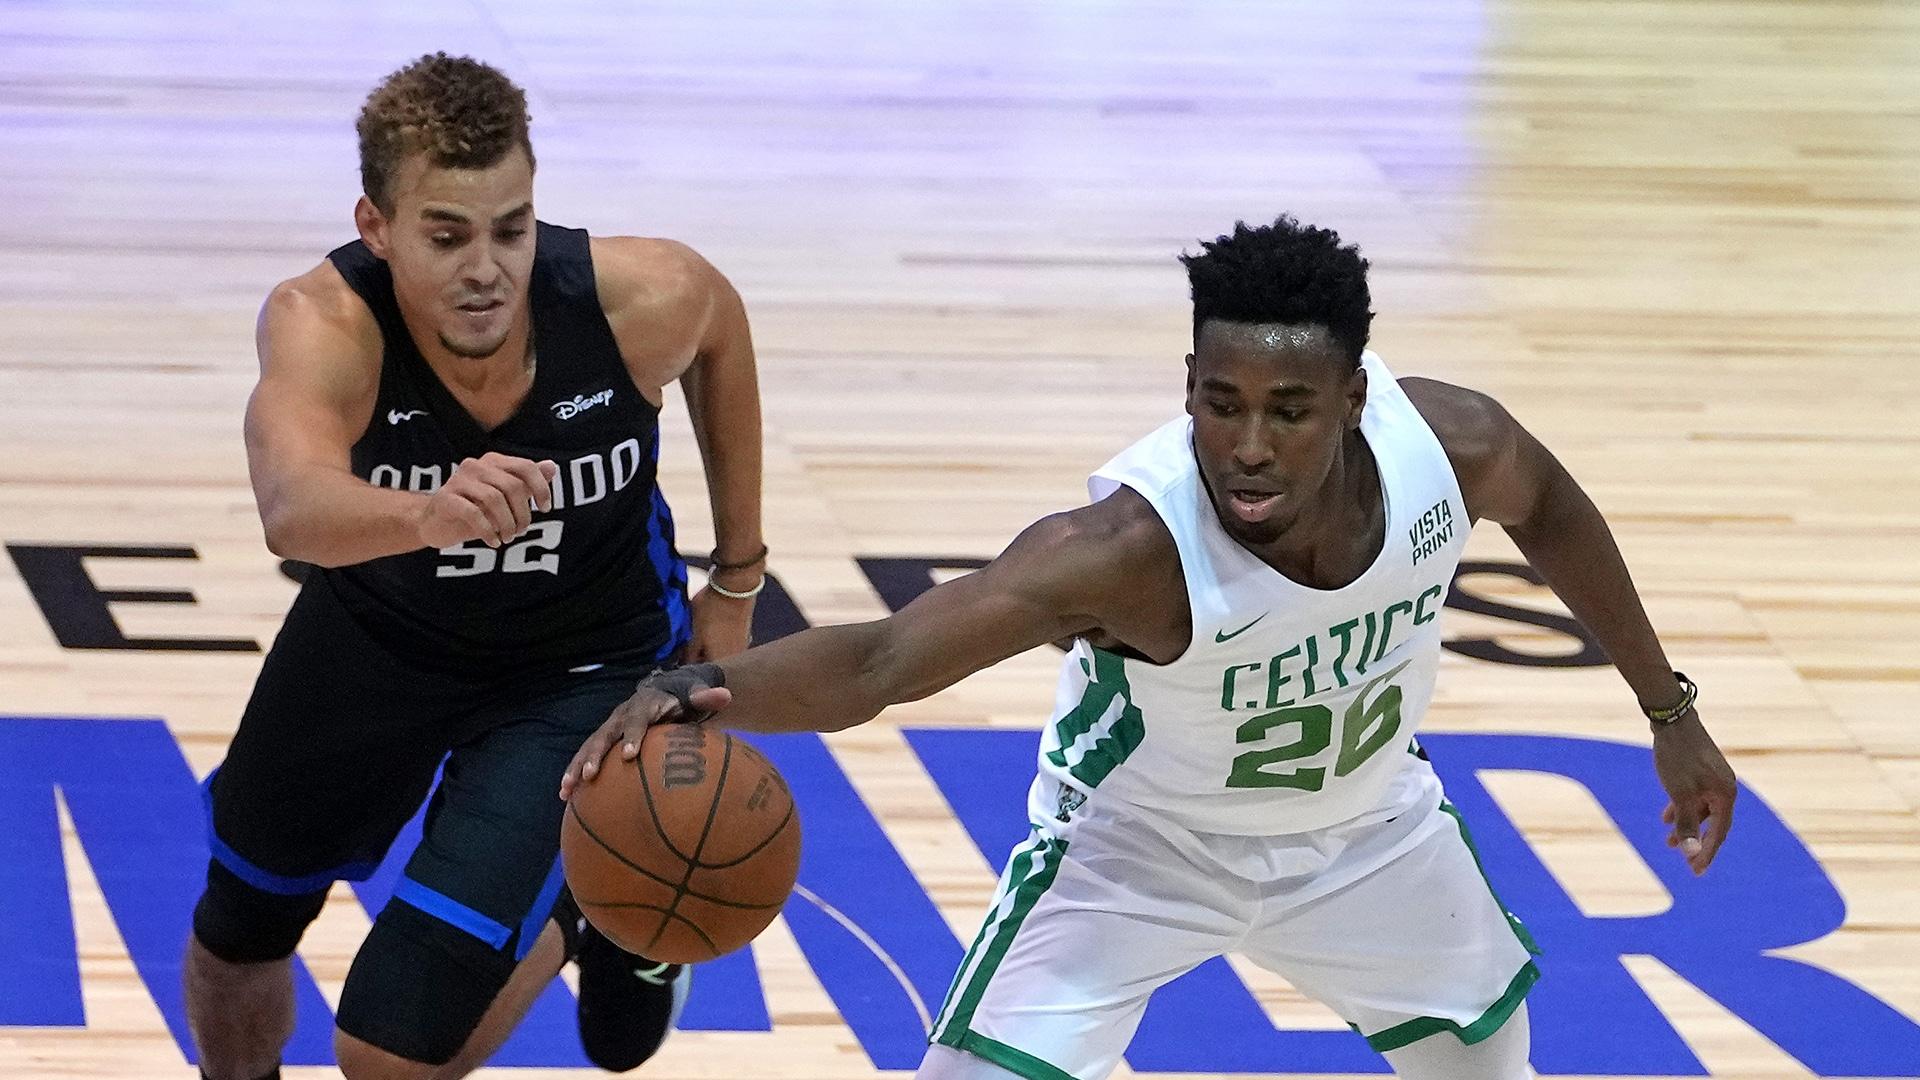 Las Vegas Summer League: Balanced attack carries Celtics over Magic